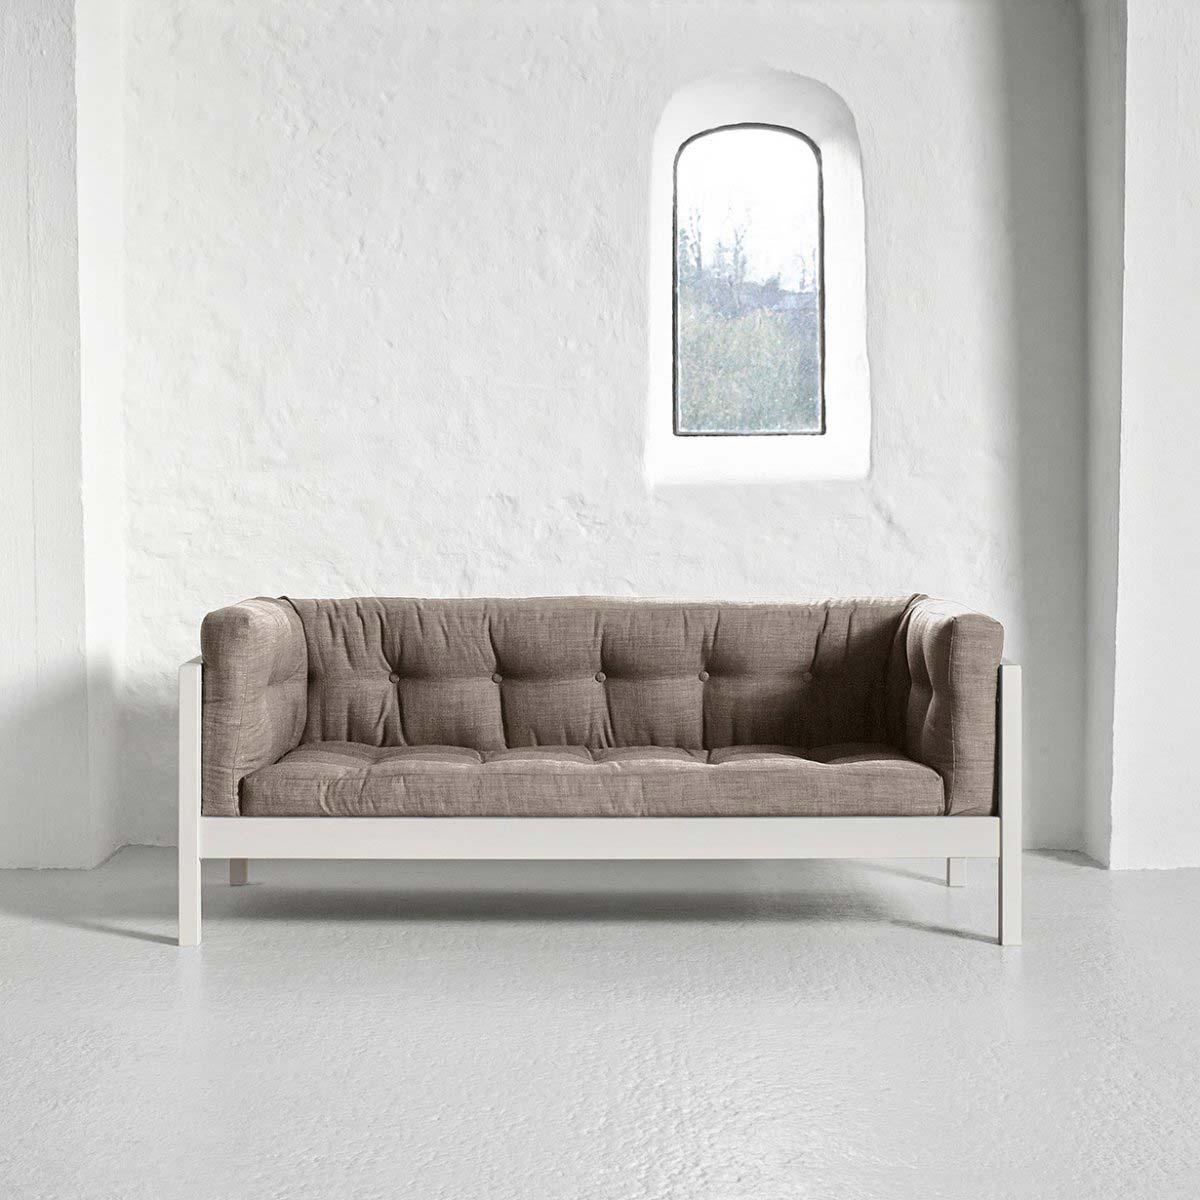 canap deux places karup. Black Bedroom Furniture Sets. Home Design Ideas